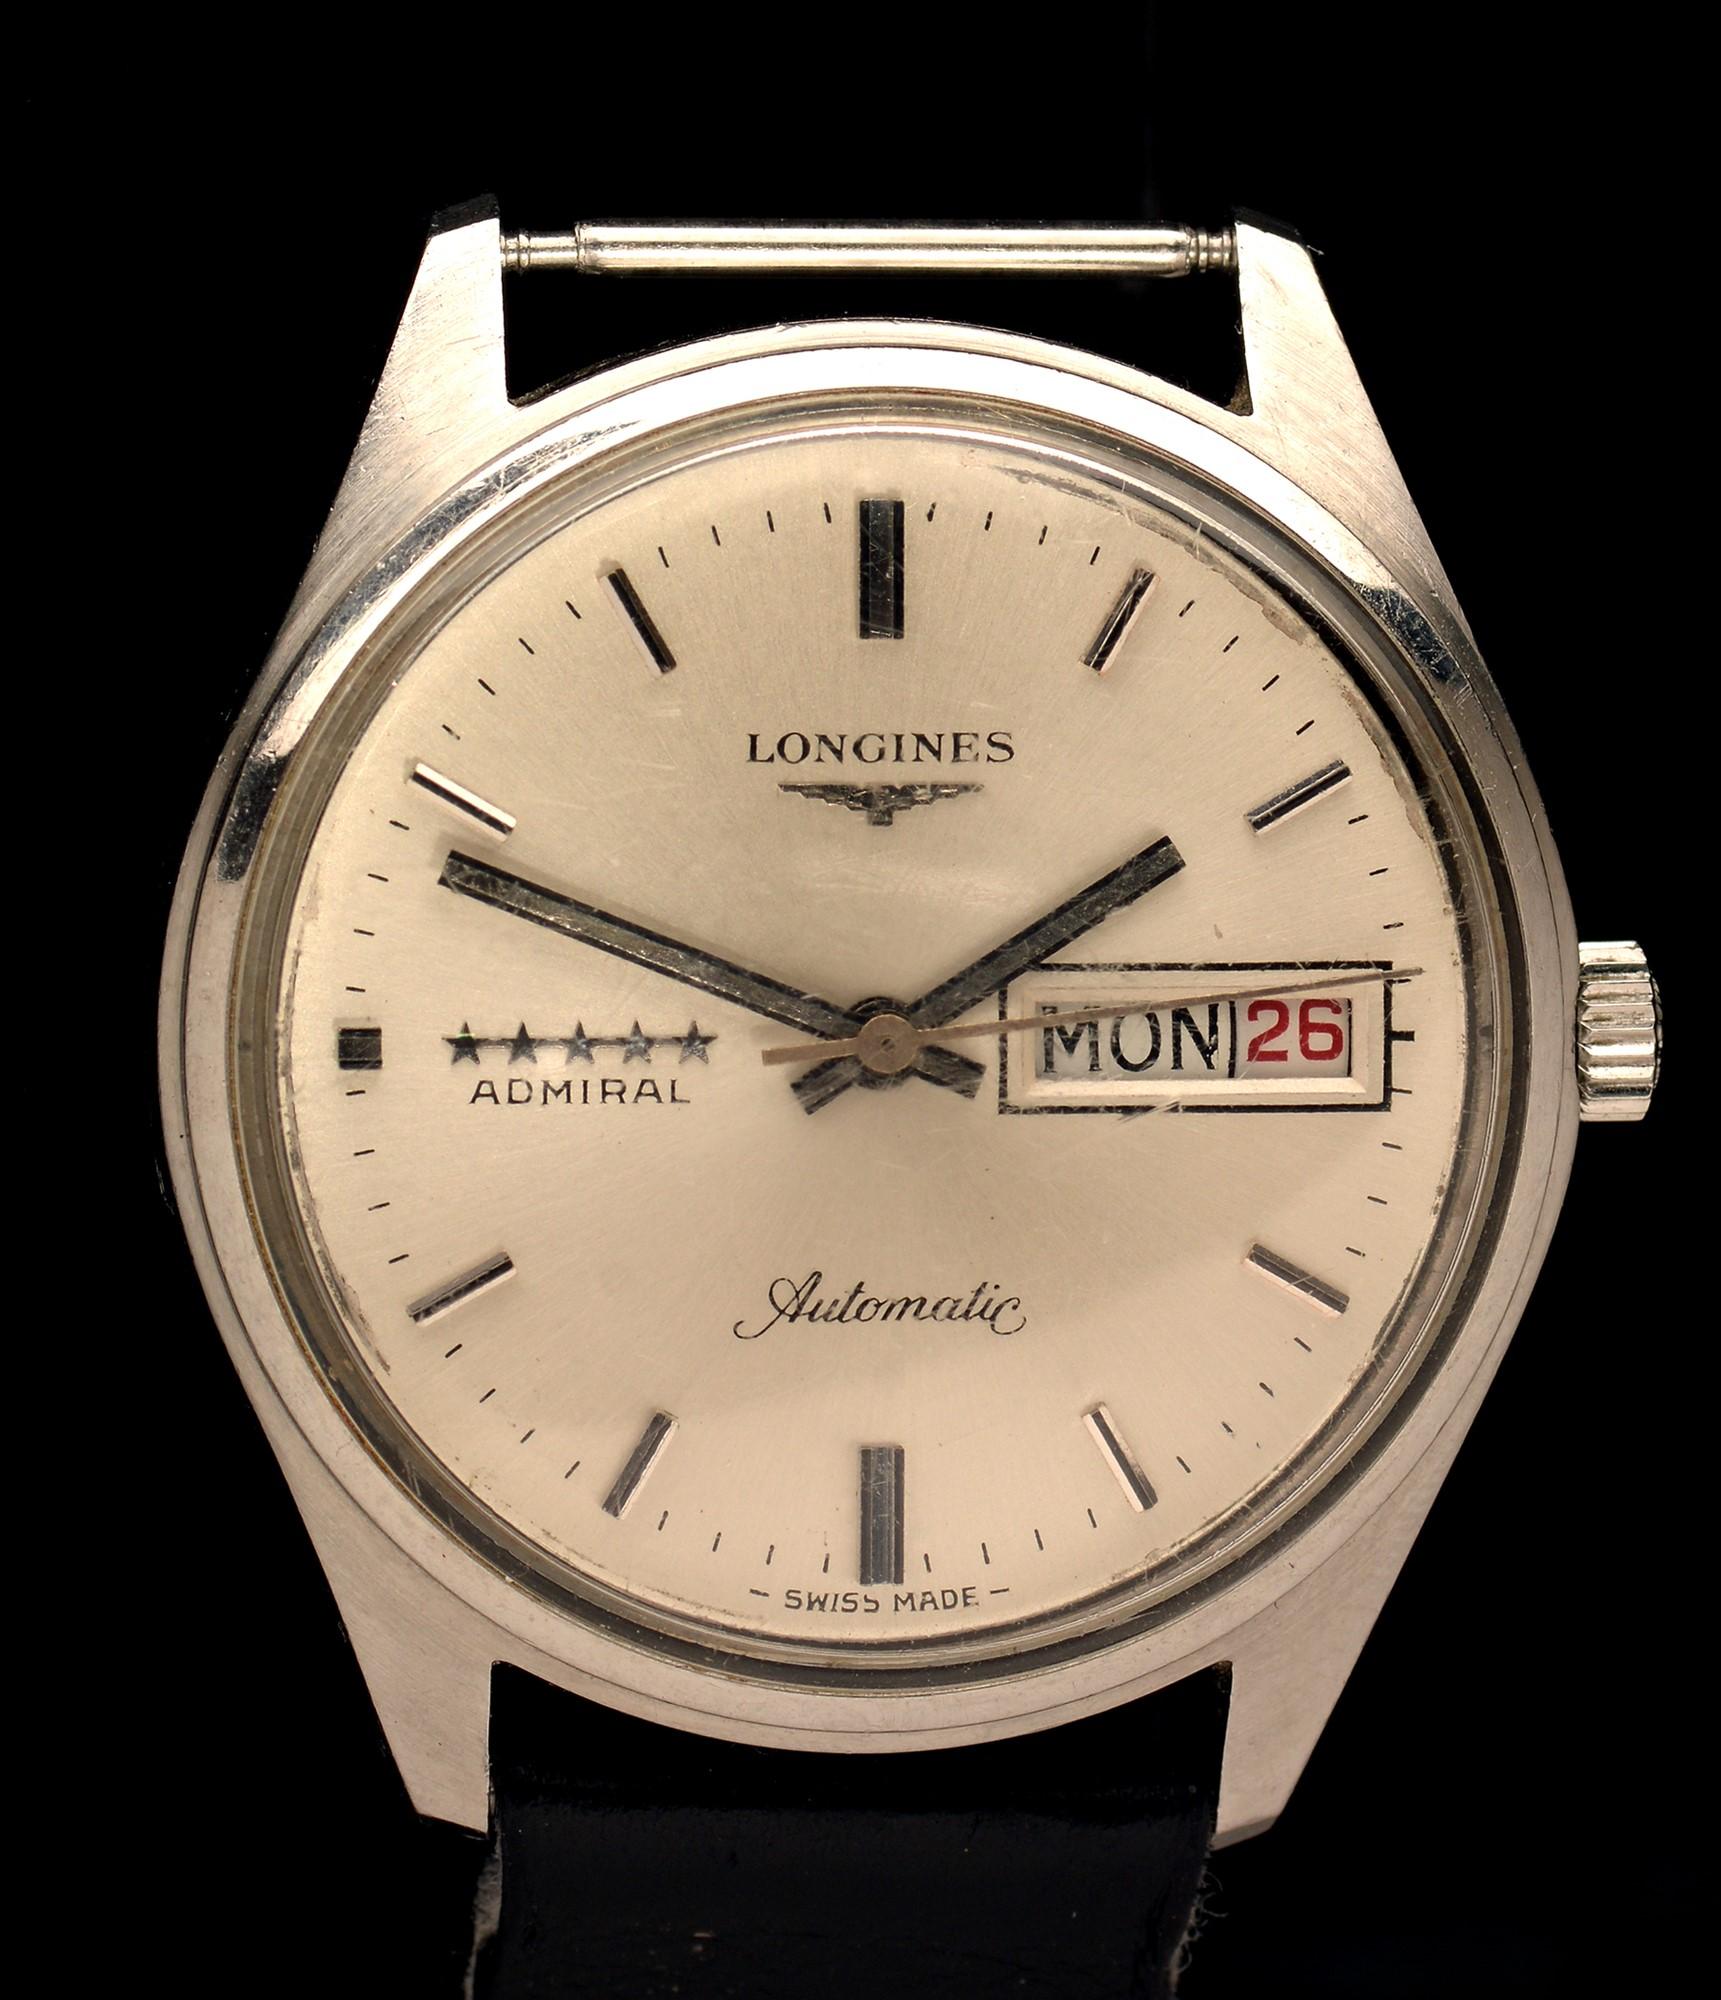 Lot 6 - Longines Admiral automatic wristwatch